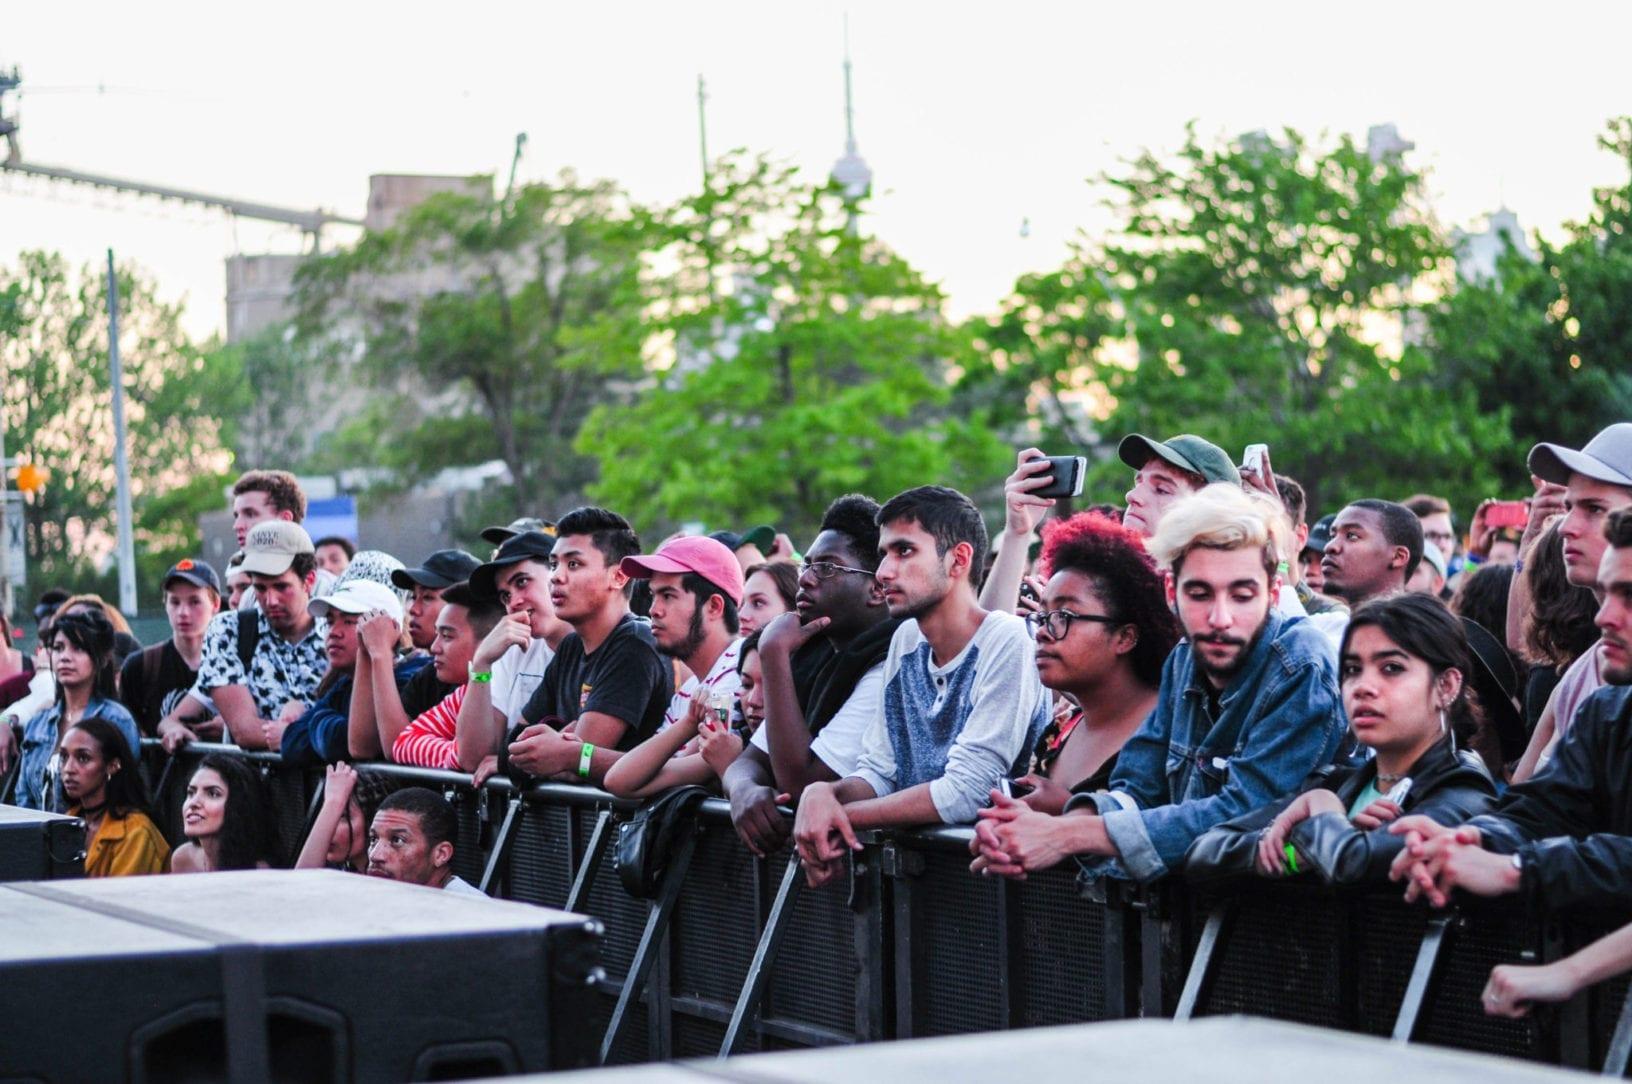 Daniel Caesar NXNE 2016 Crowd